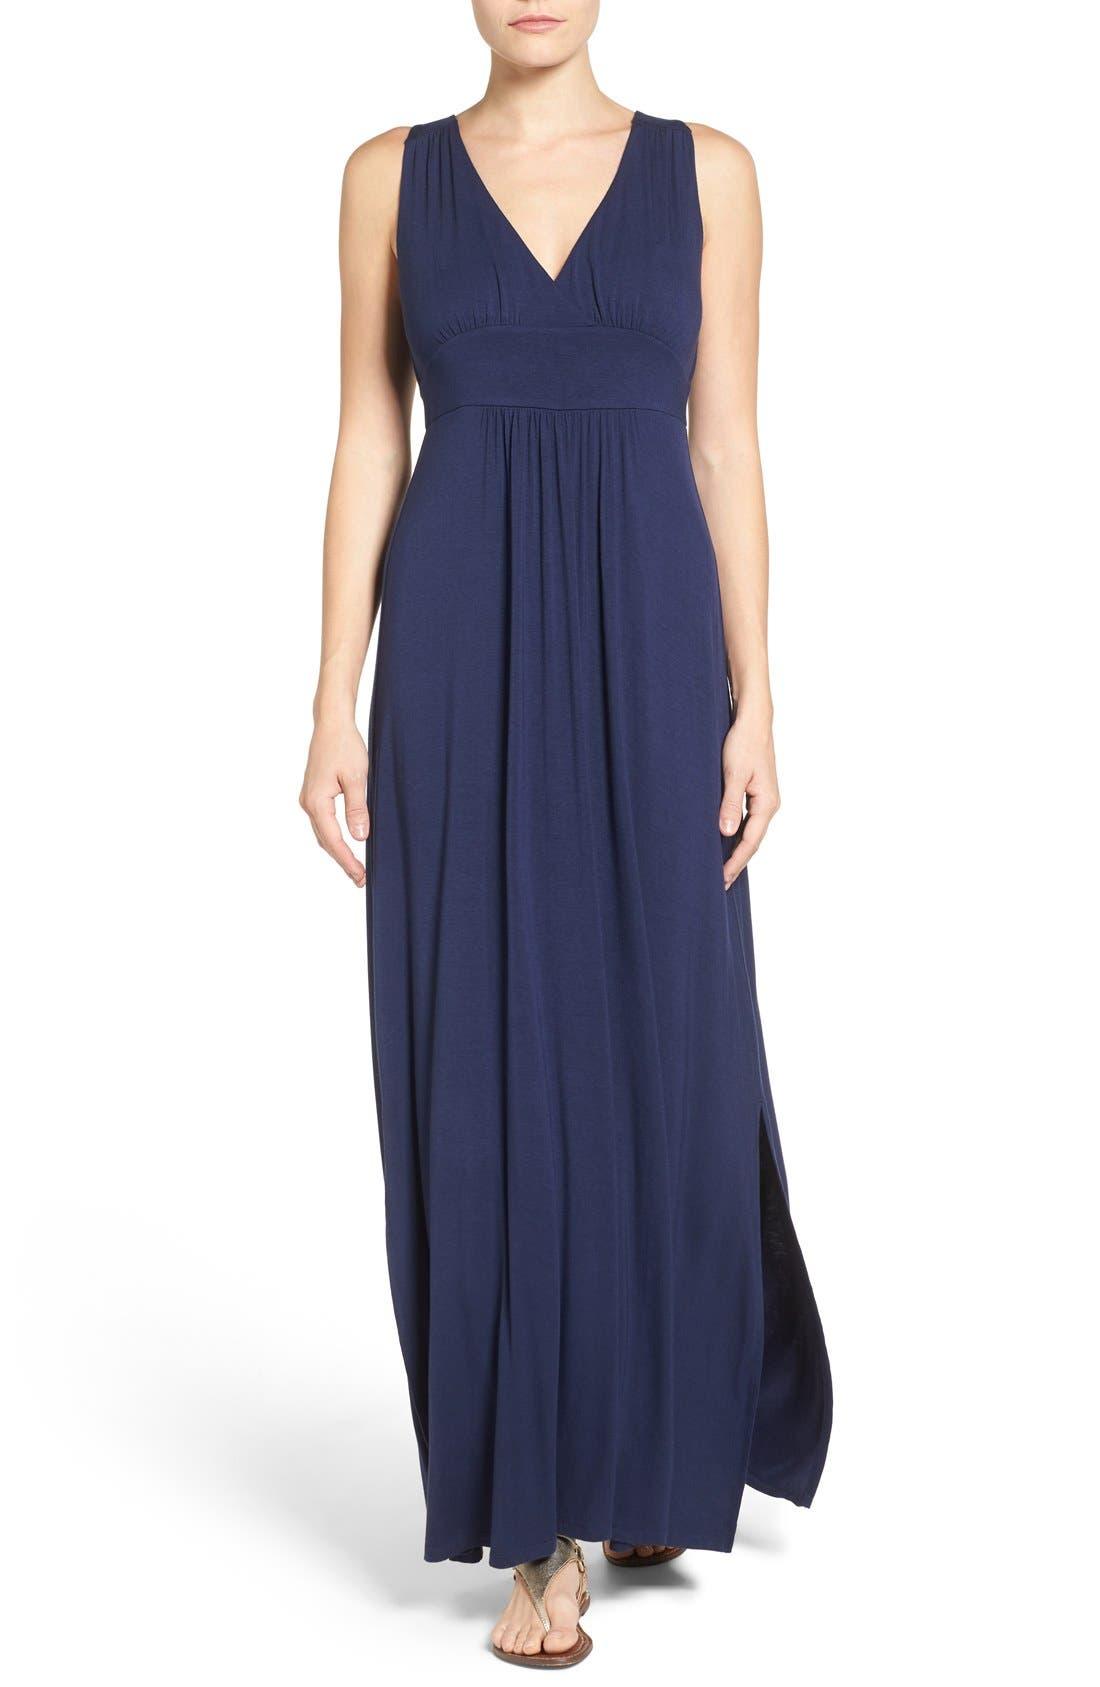 Alternate Image 1 Selected - Caslon® Knit Maxi Dress (Regular & Petite)